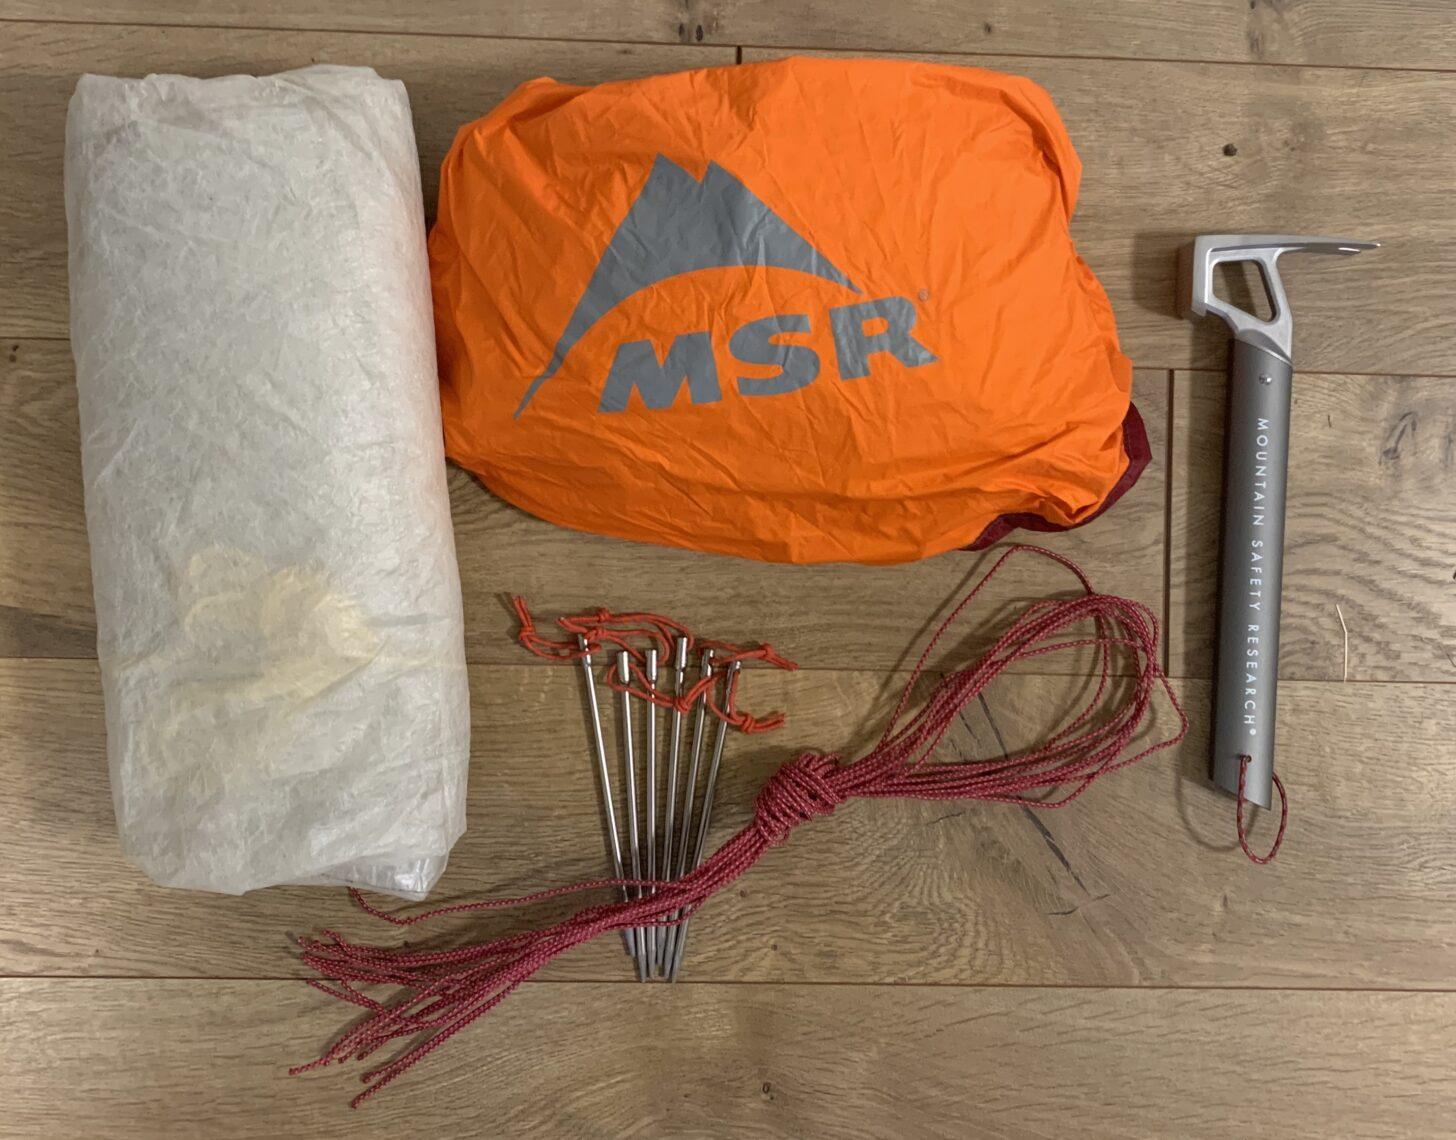 tarp, bivy sack, nail stakes, extra guylines, and a stake hammer